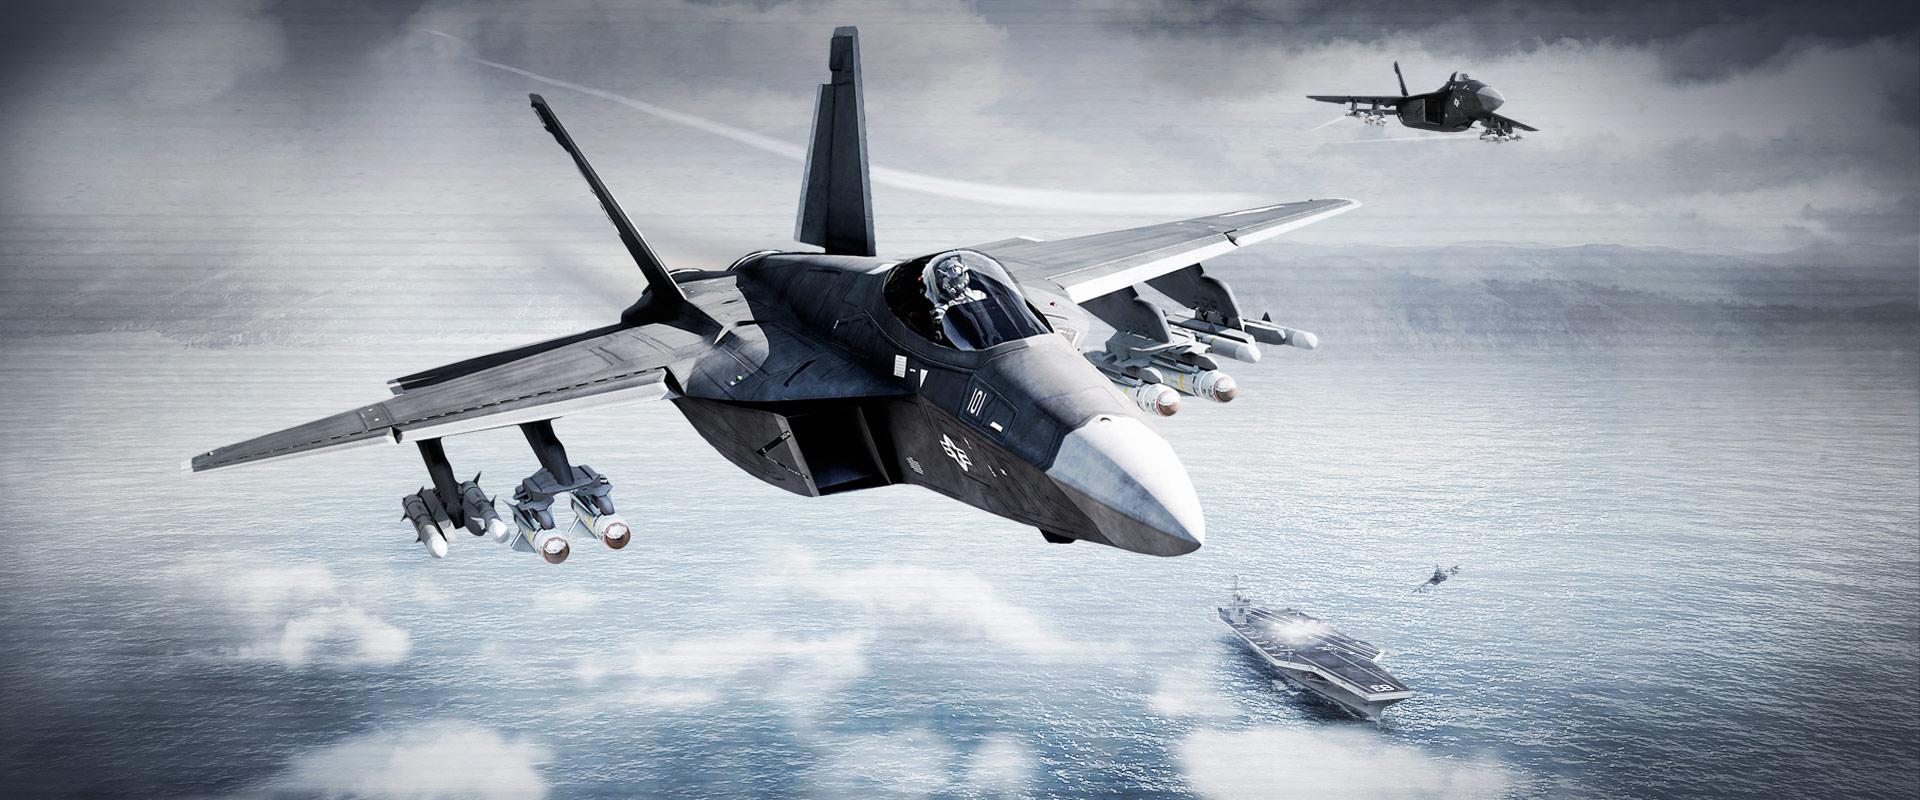 Jets | Arma 3